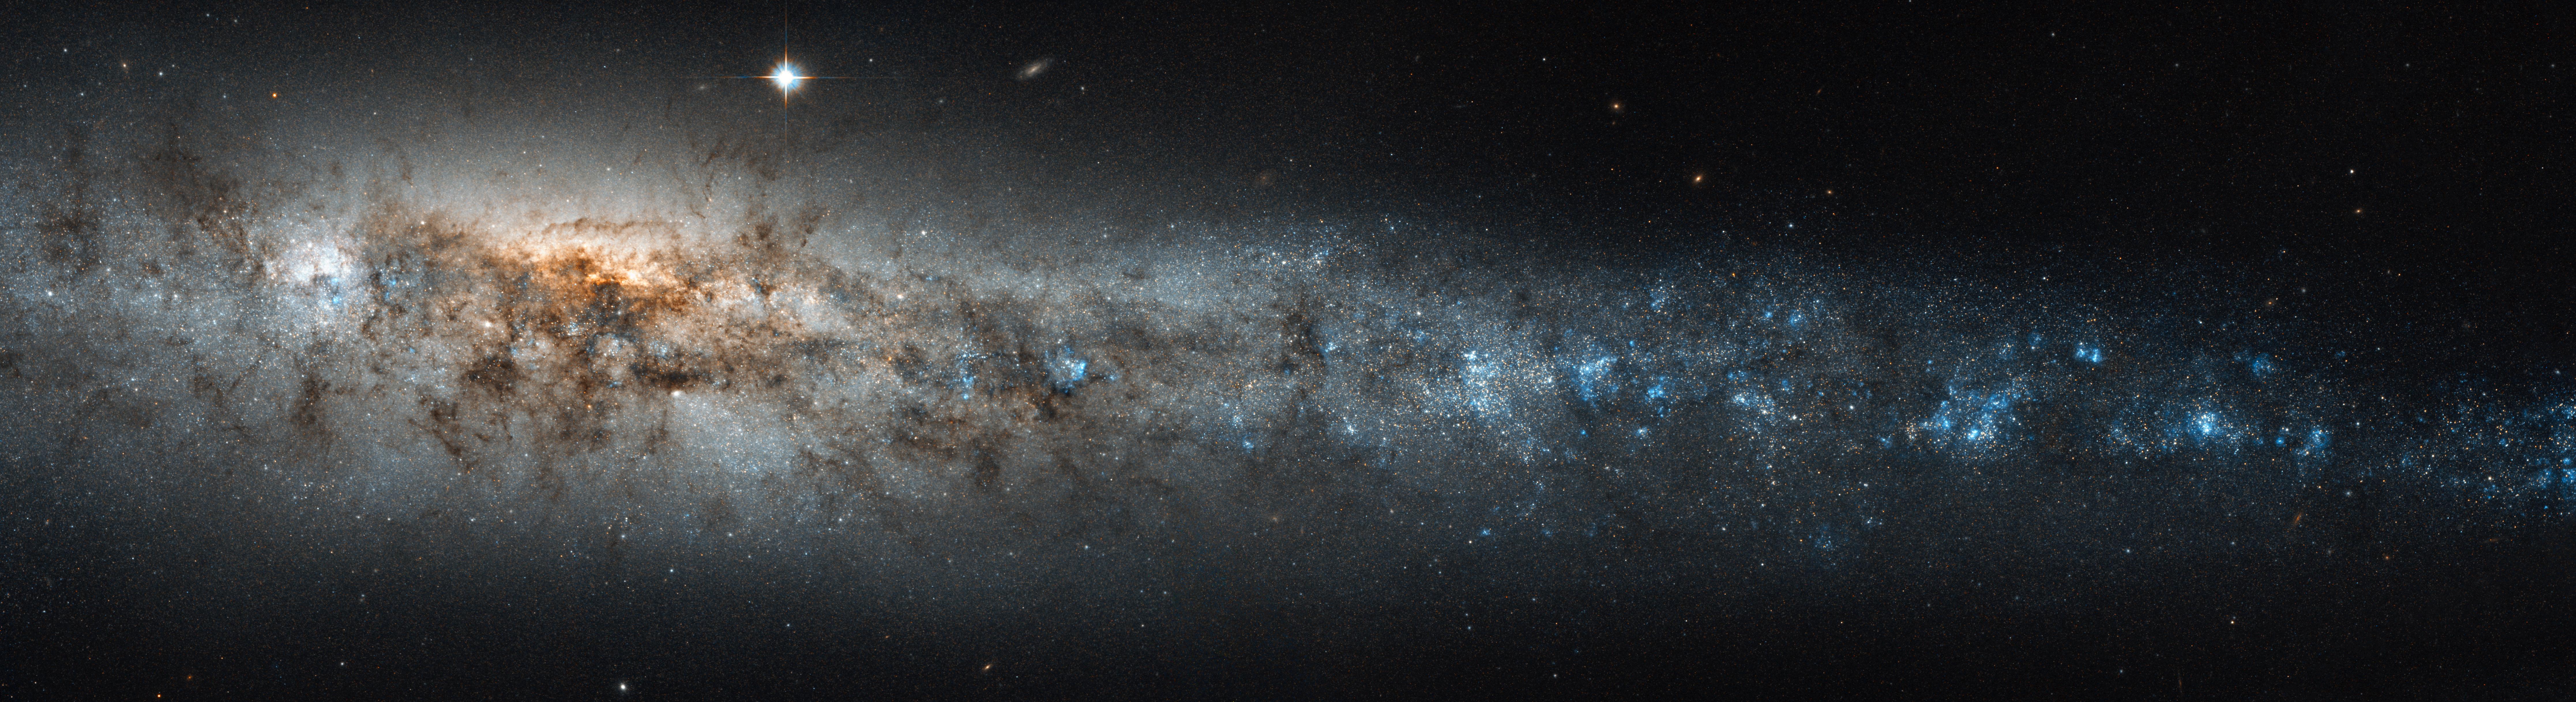 nasa high res galaxy wallpaper - photo #25